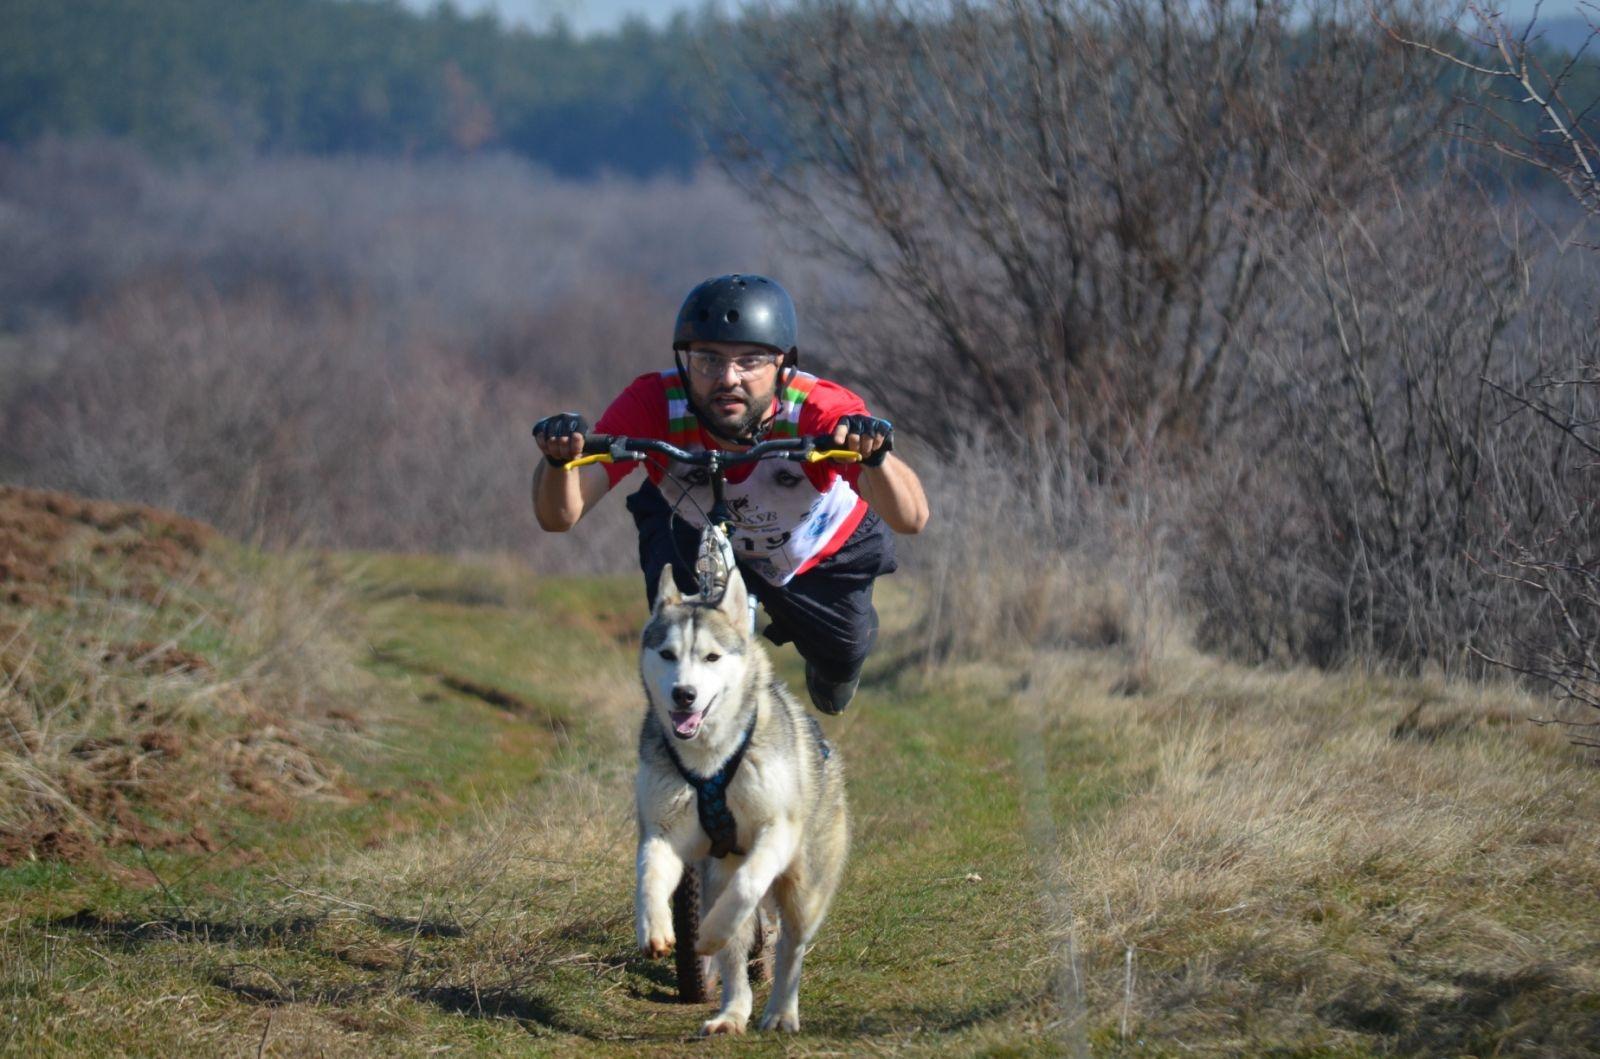 Northern Howl Northern Howl  X-Back harnais pour chien pour le vélo, ski-joering, scooter, traîneau